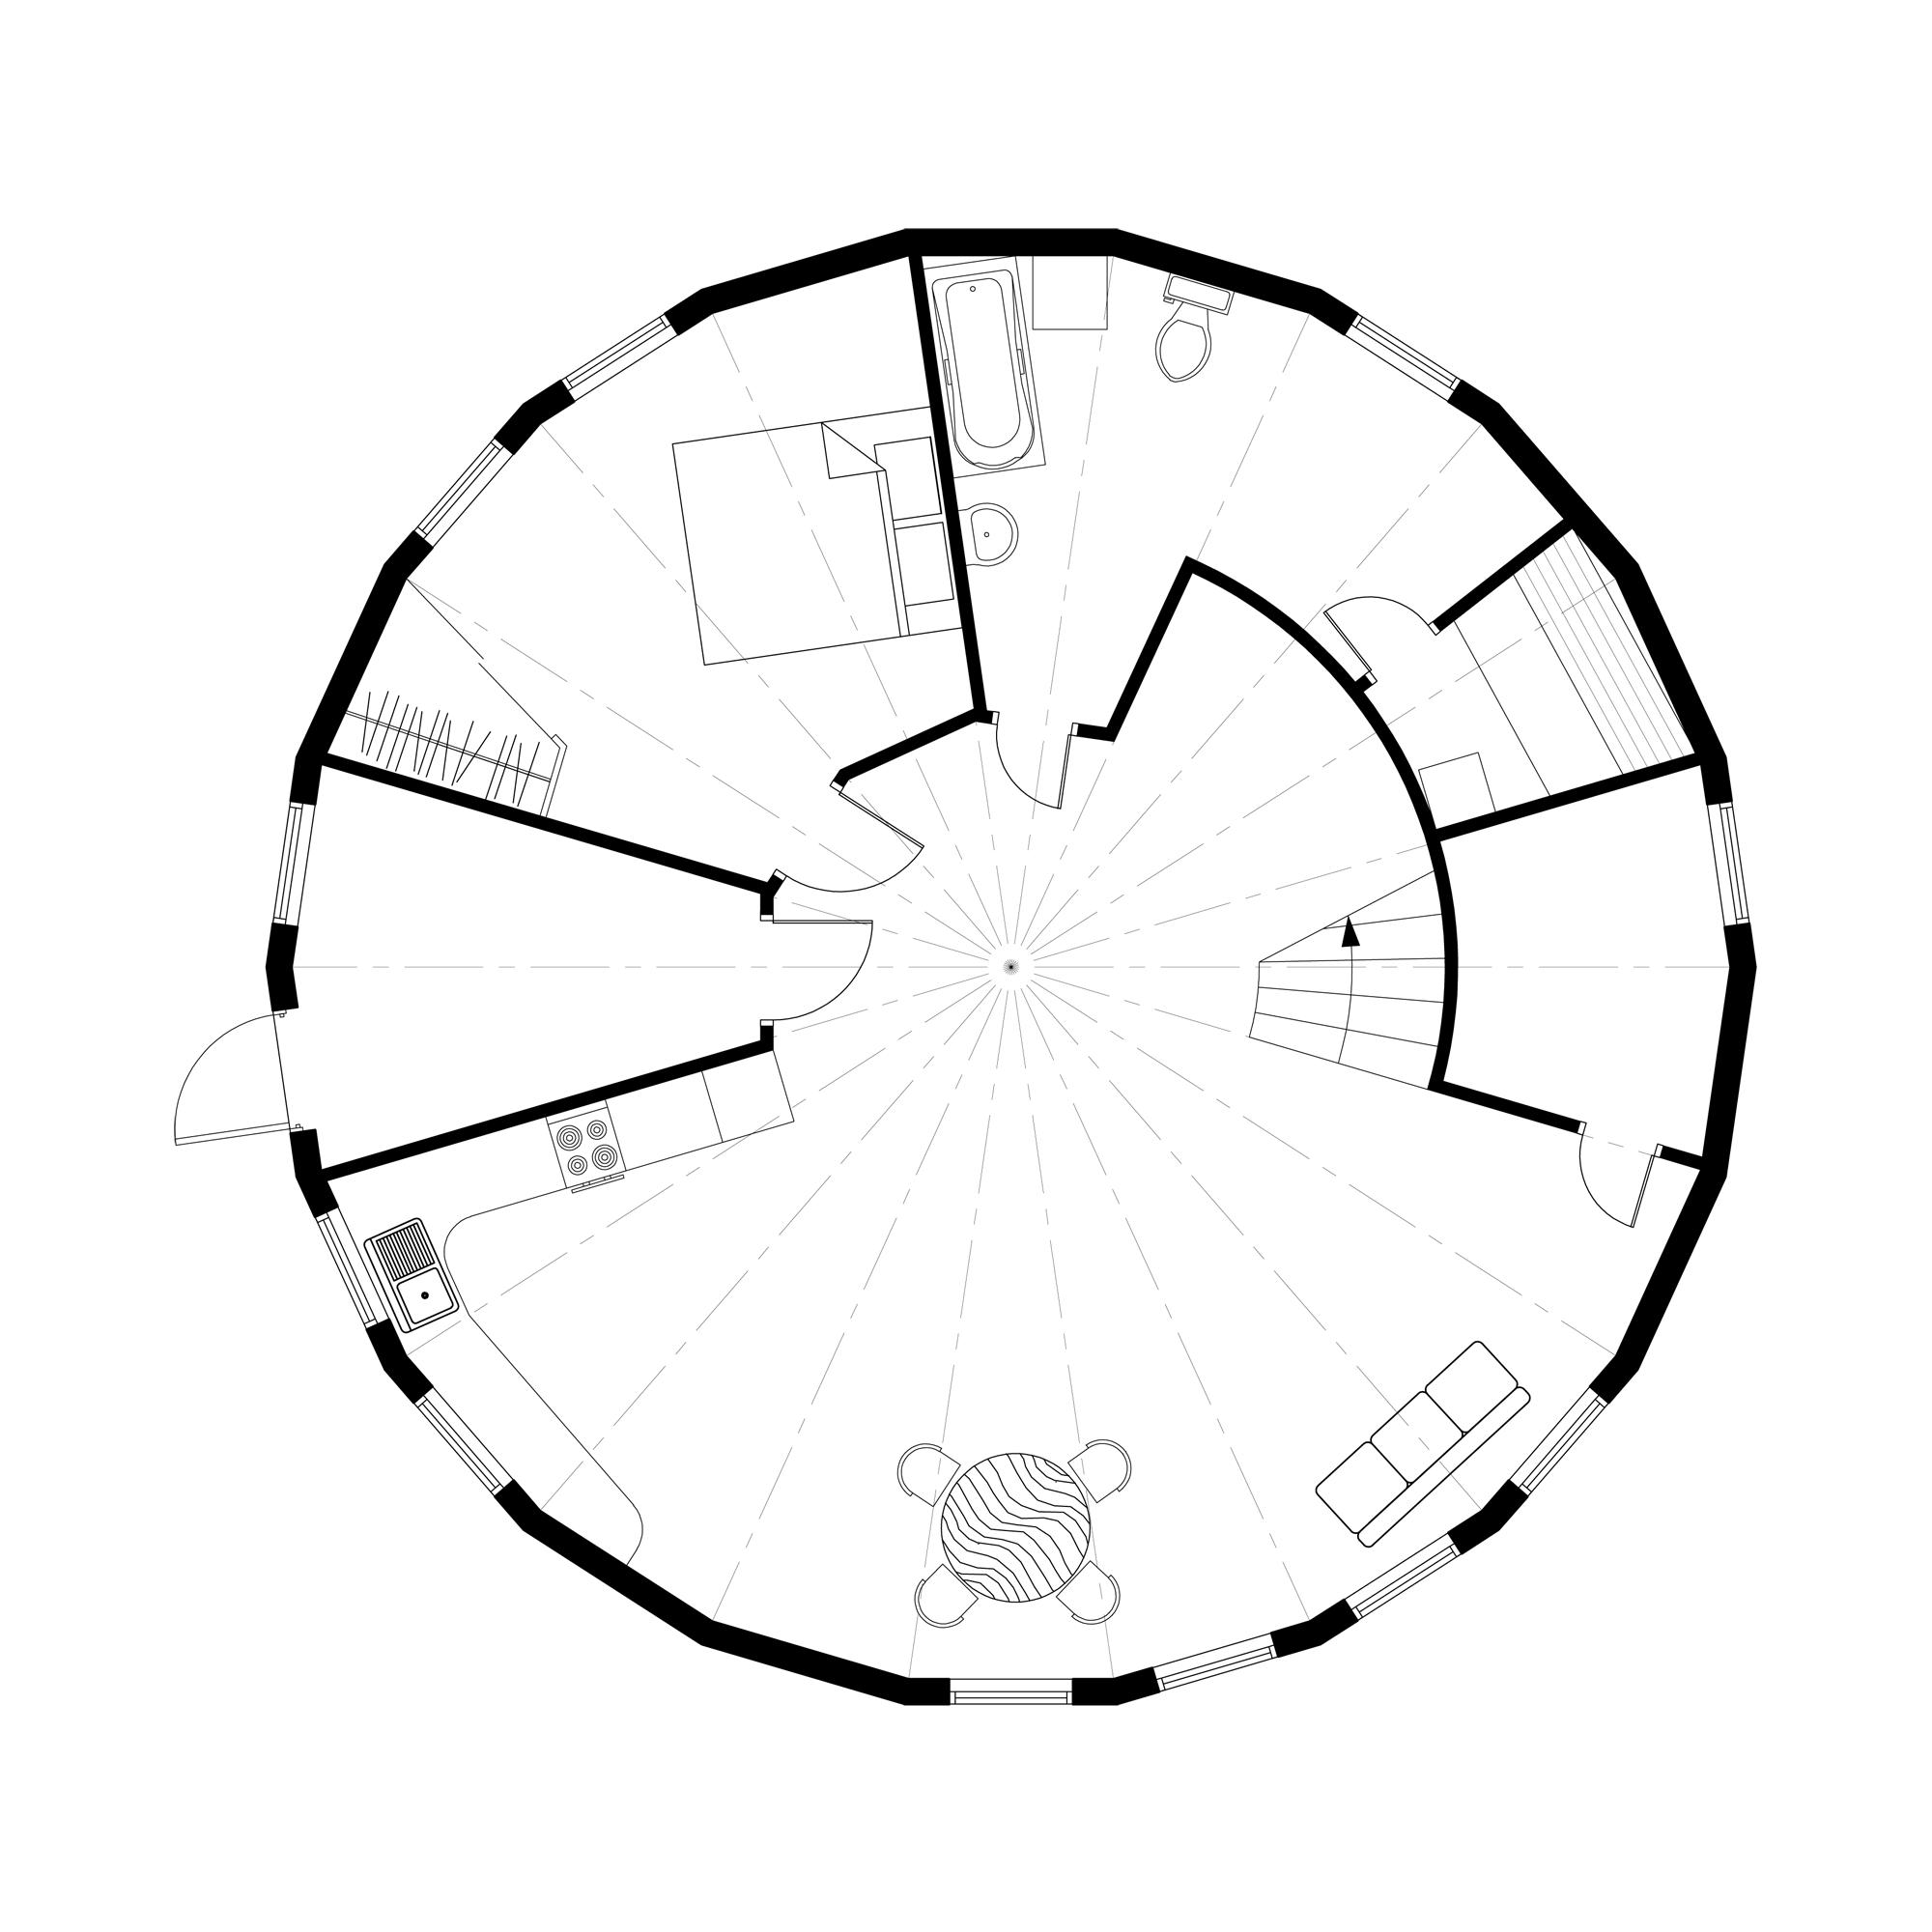 prodaja-karkasa-dla-doma-sferi-planirovka2.png - 379.21 kB